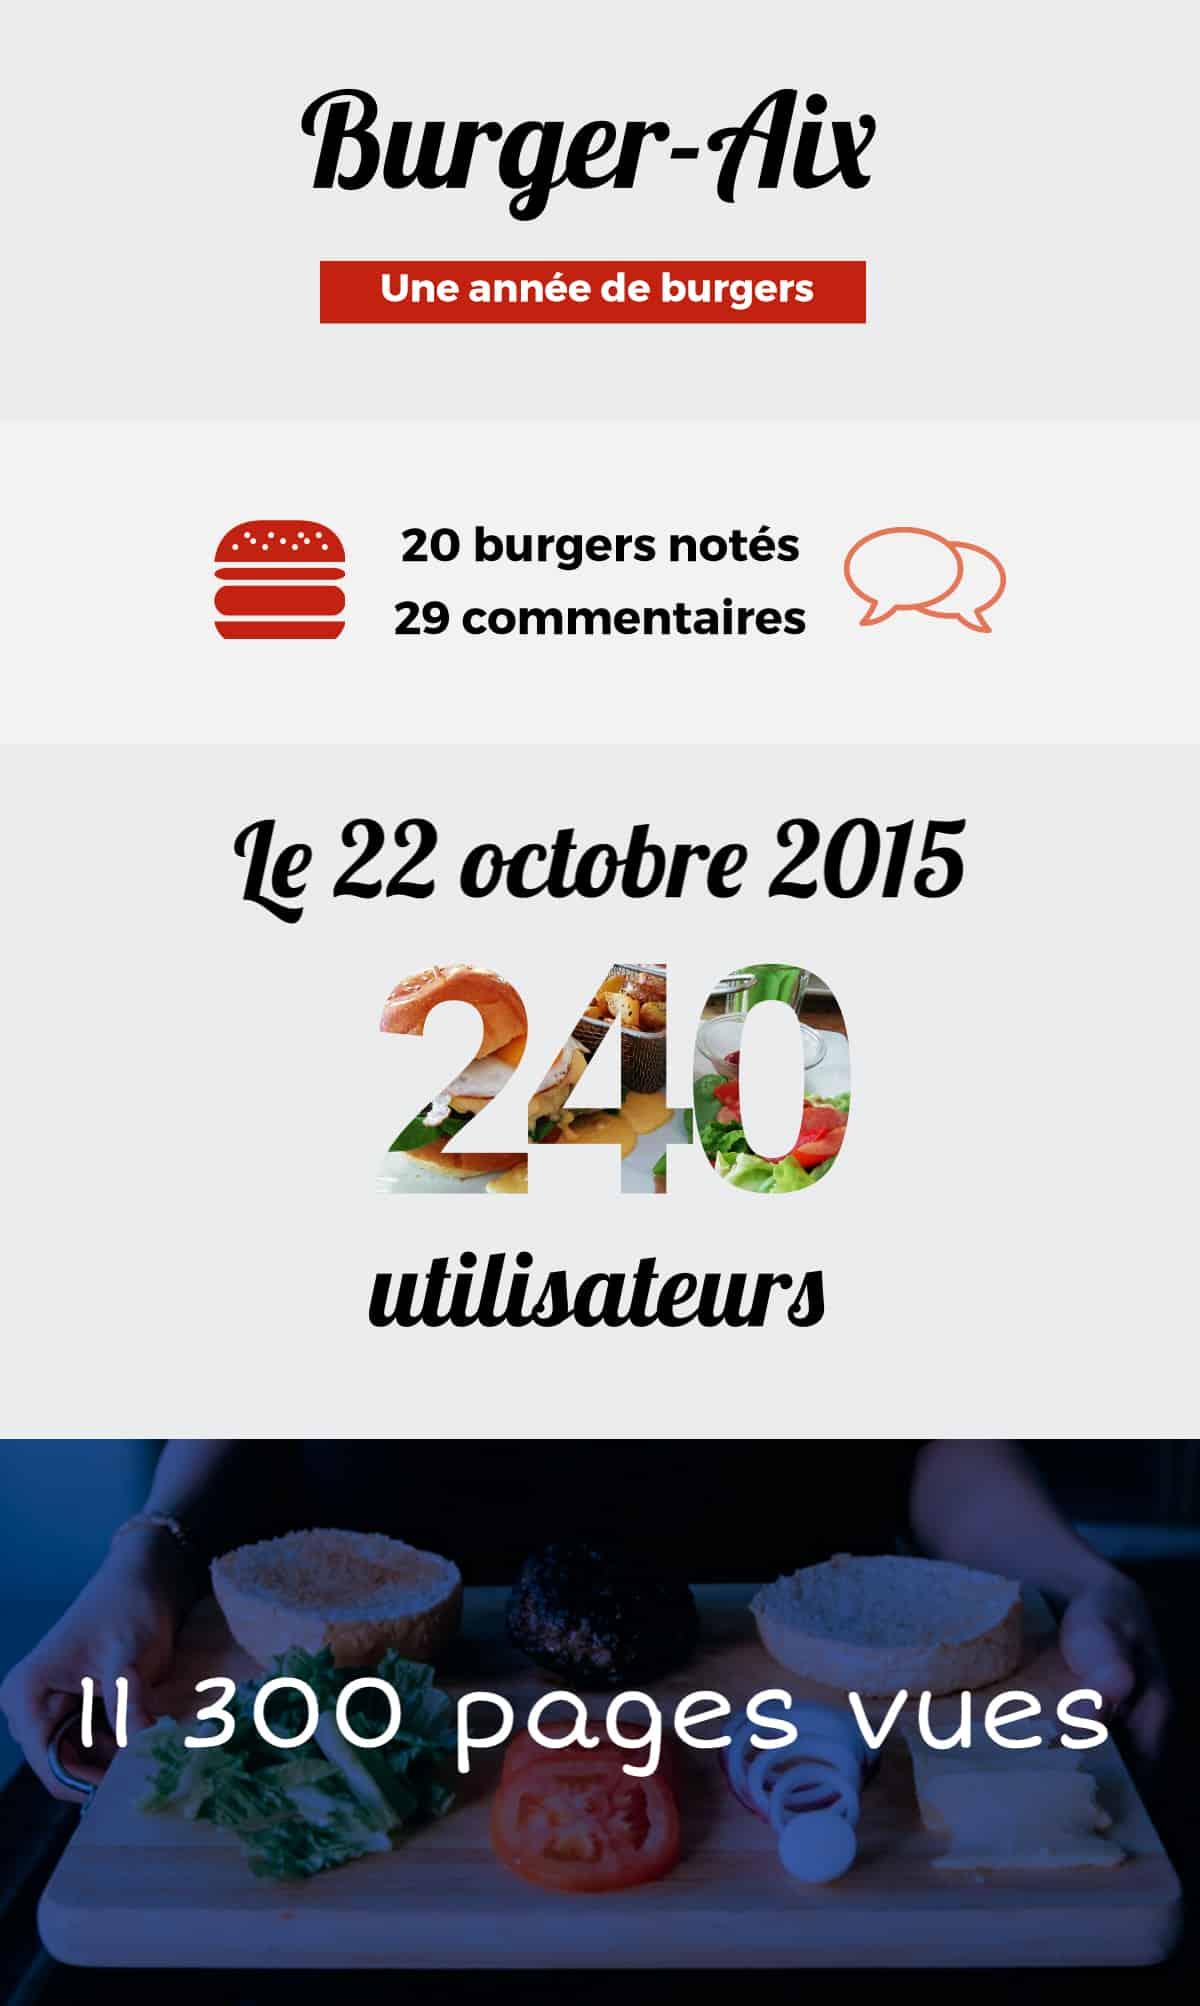 infographie-burger-aix